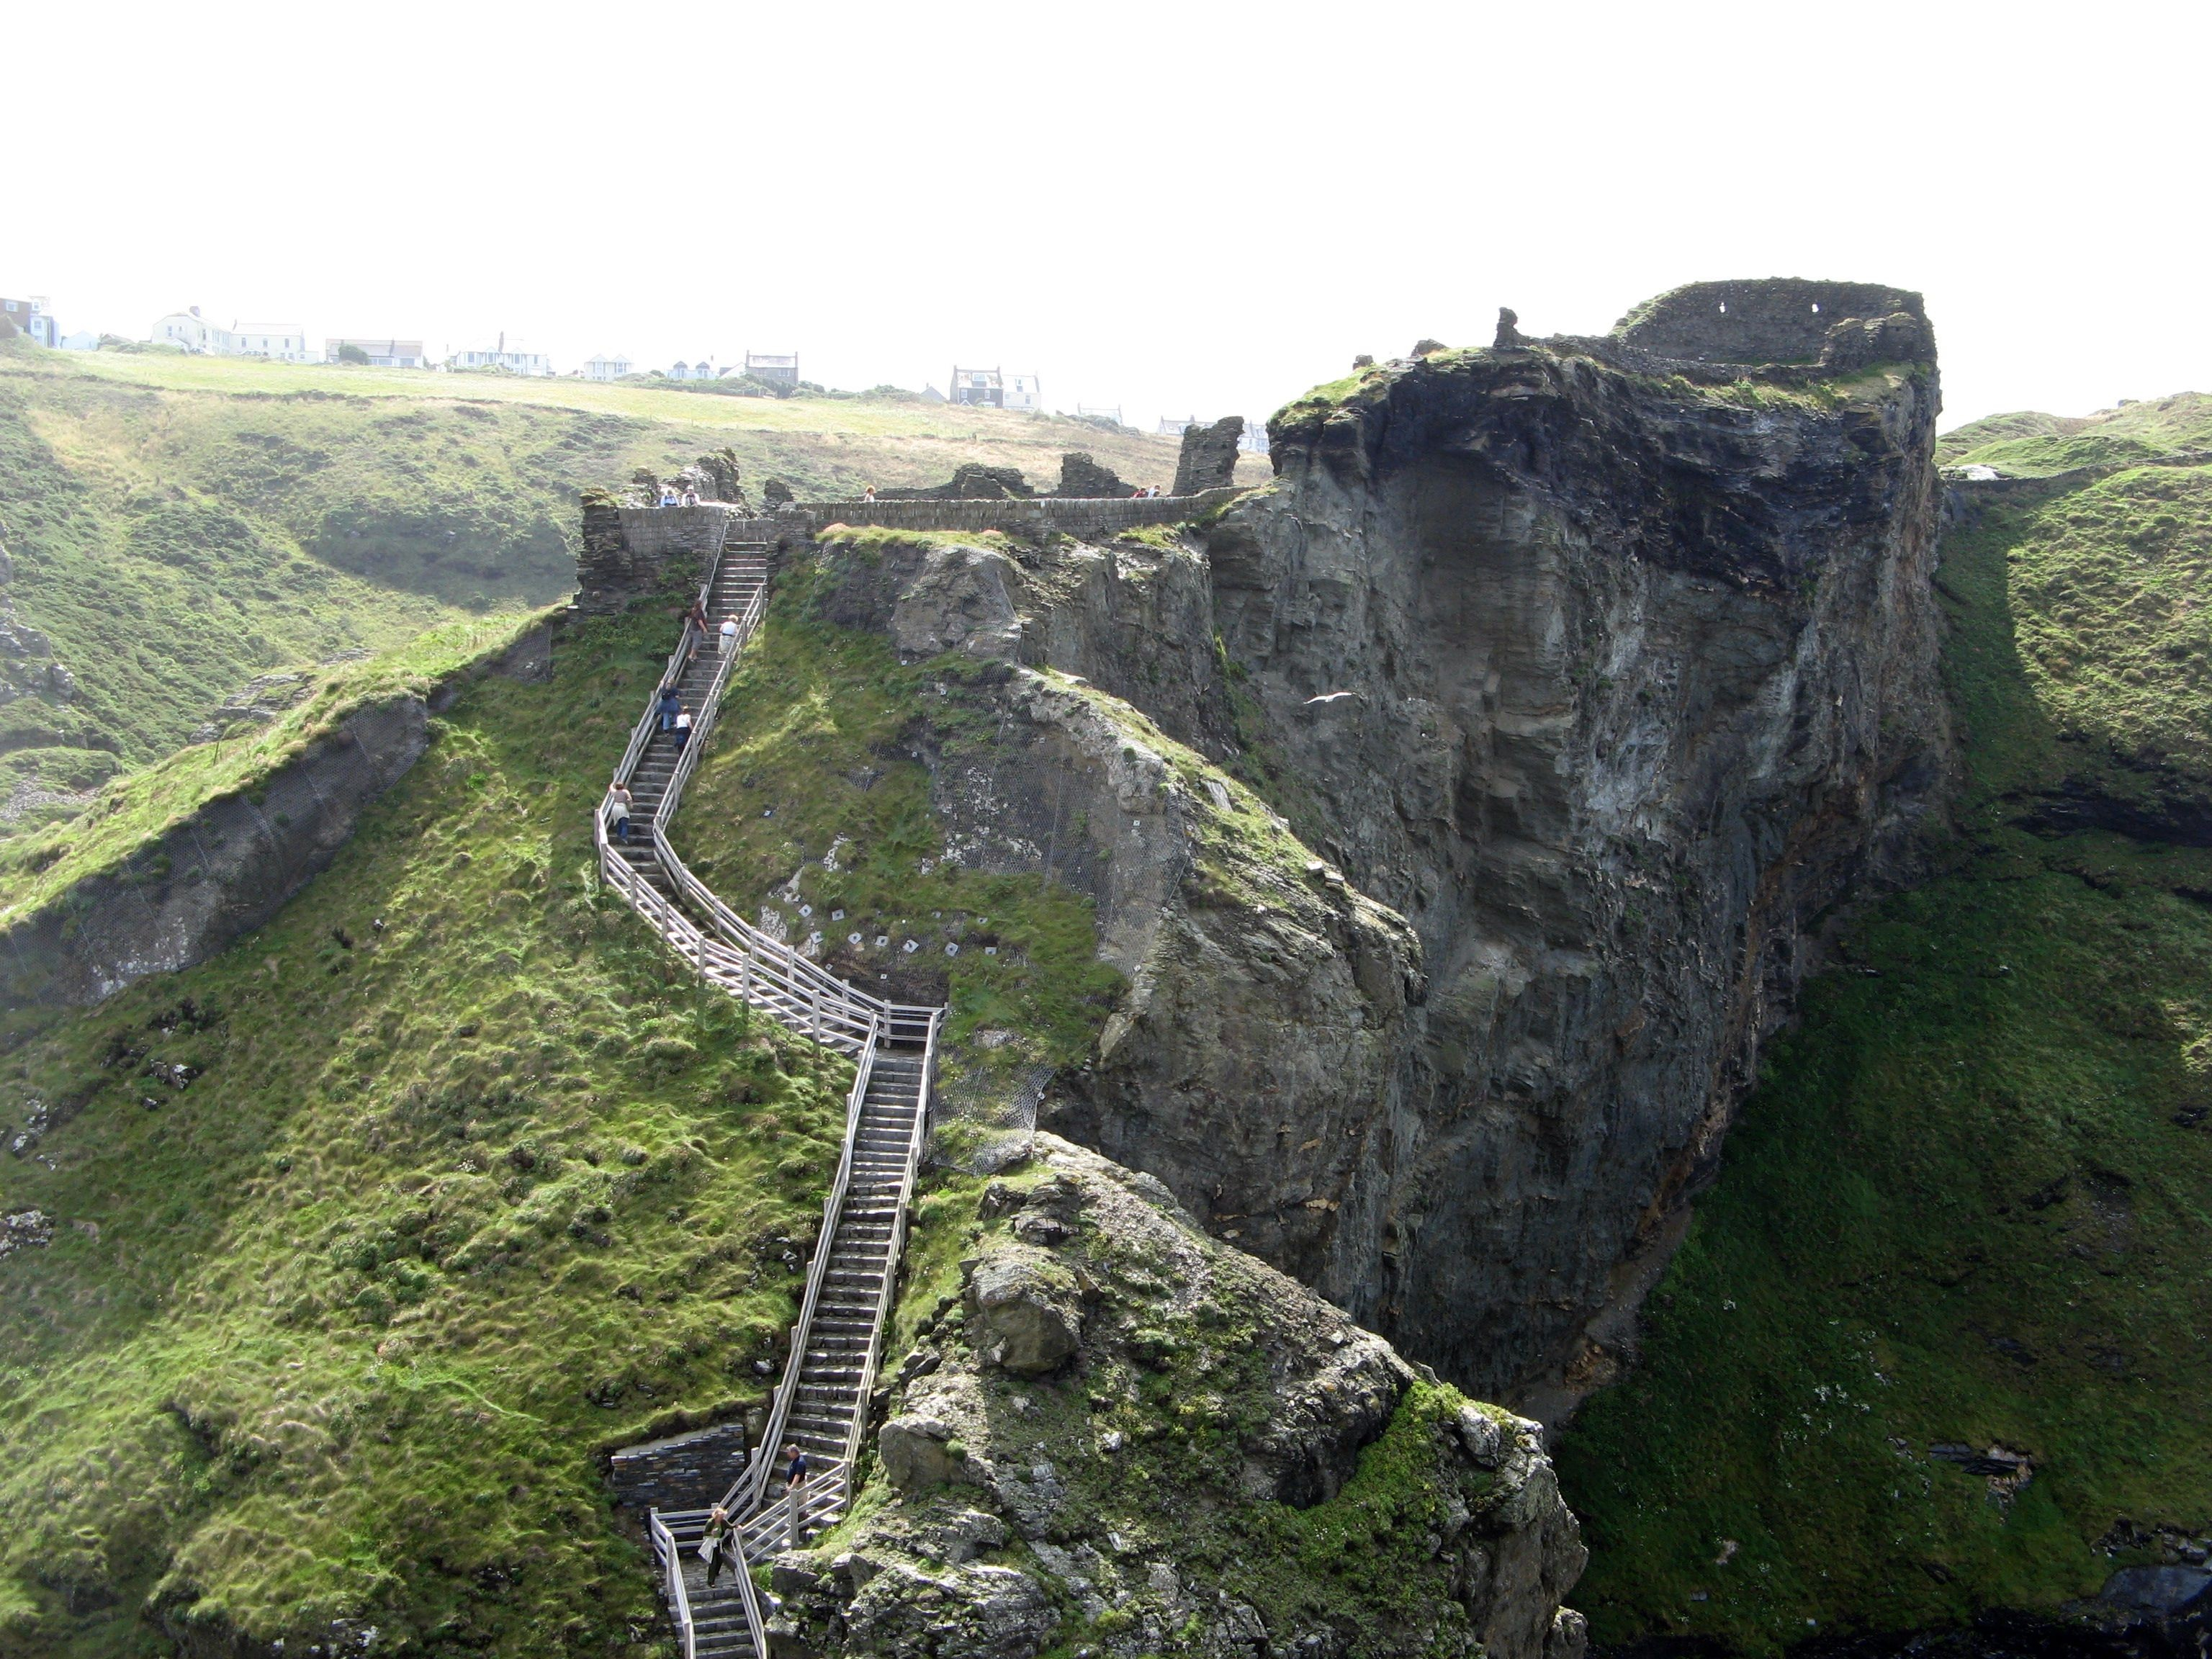 Ruínas de Tintagel, local onde Arthur teria vivido (Foto: Wikimedia/Rawac)